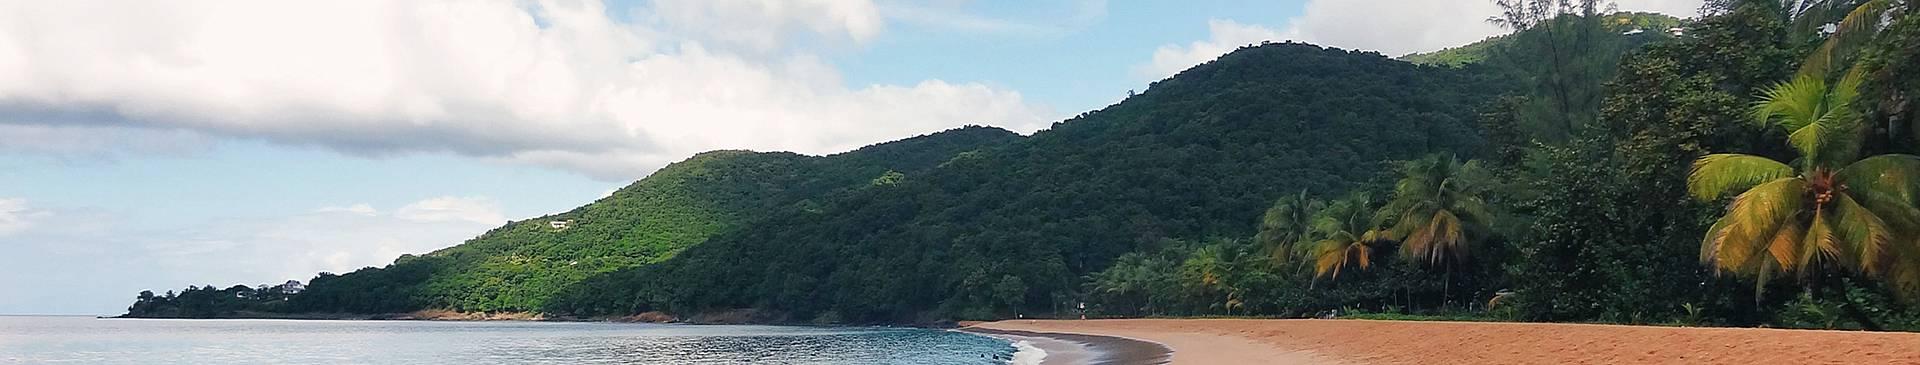 Voyage plage en Guadeloupe